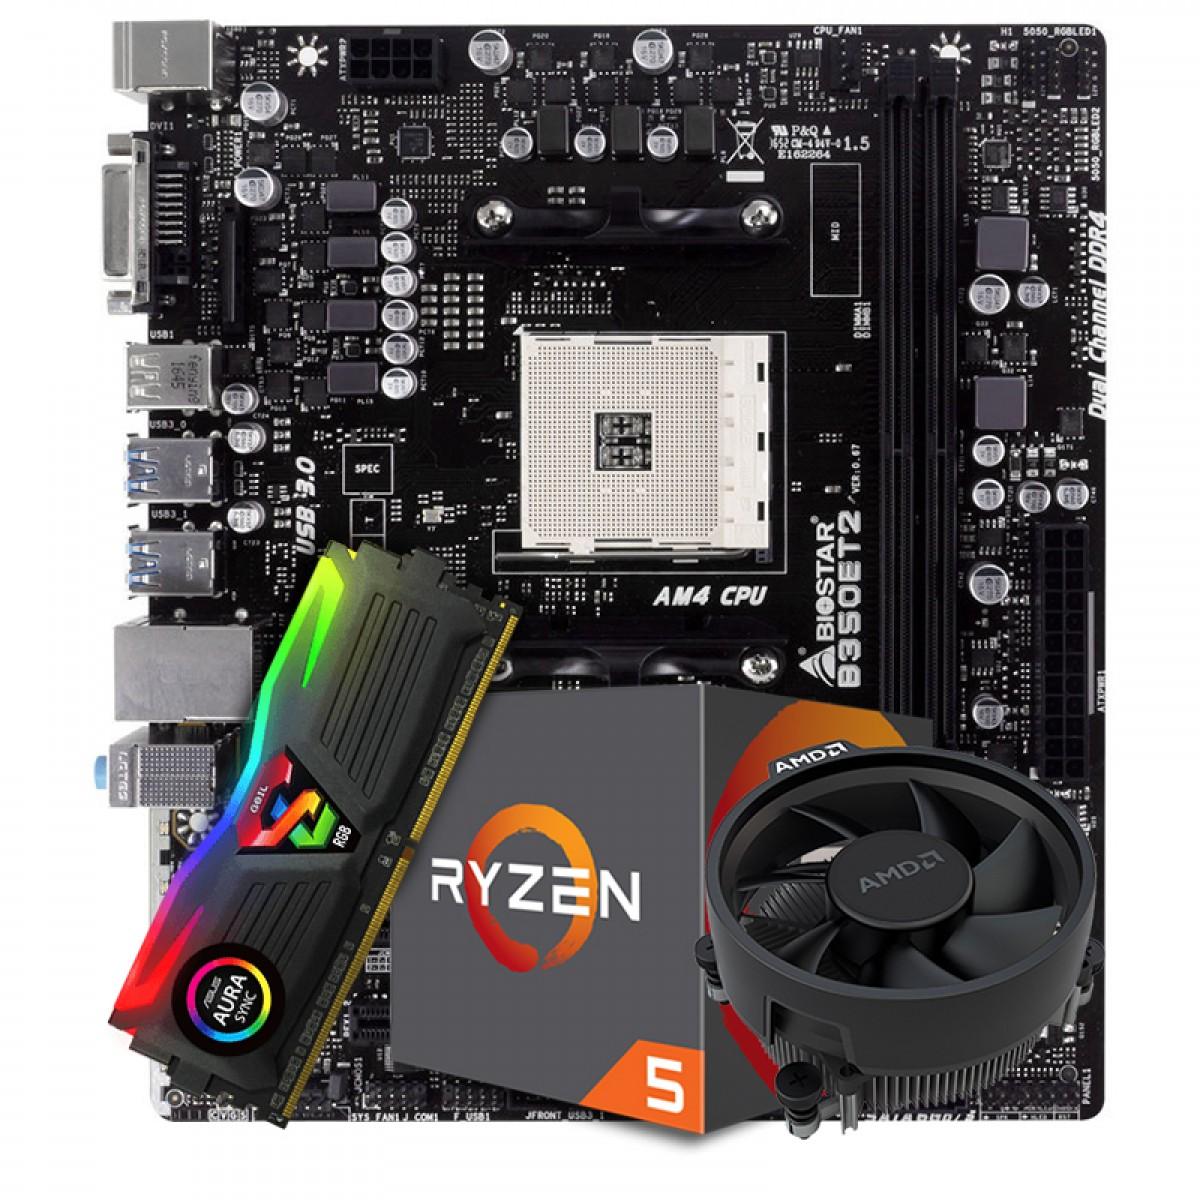 Kit Upgrade Placa Mãe Biostar Racing B350ET2 AMD AM4 DDR4 + Processador AMD Ryzen 5 2600 3.6GHz + Memória DDR4 8GB 3000MHZ